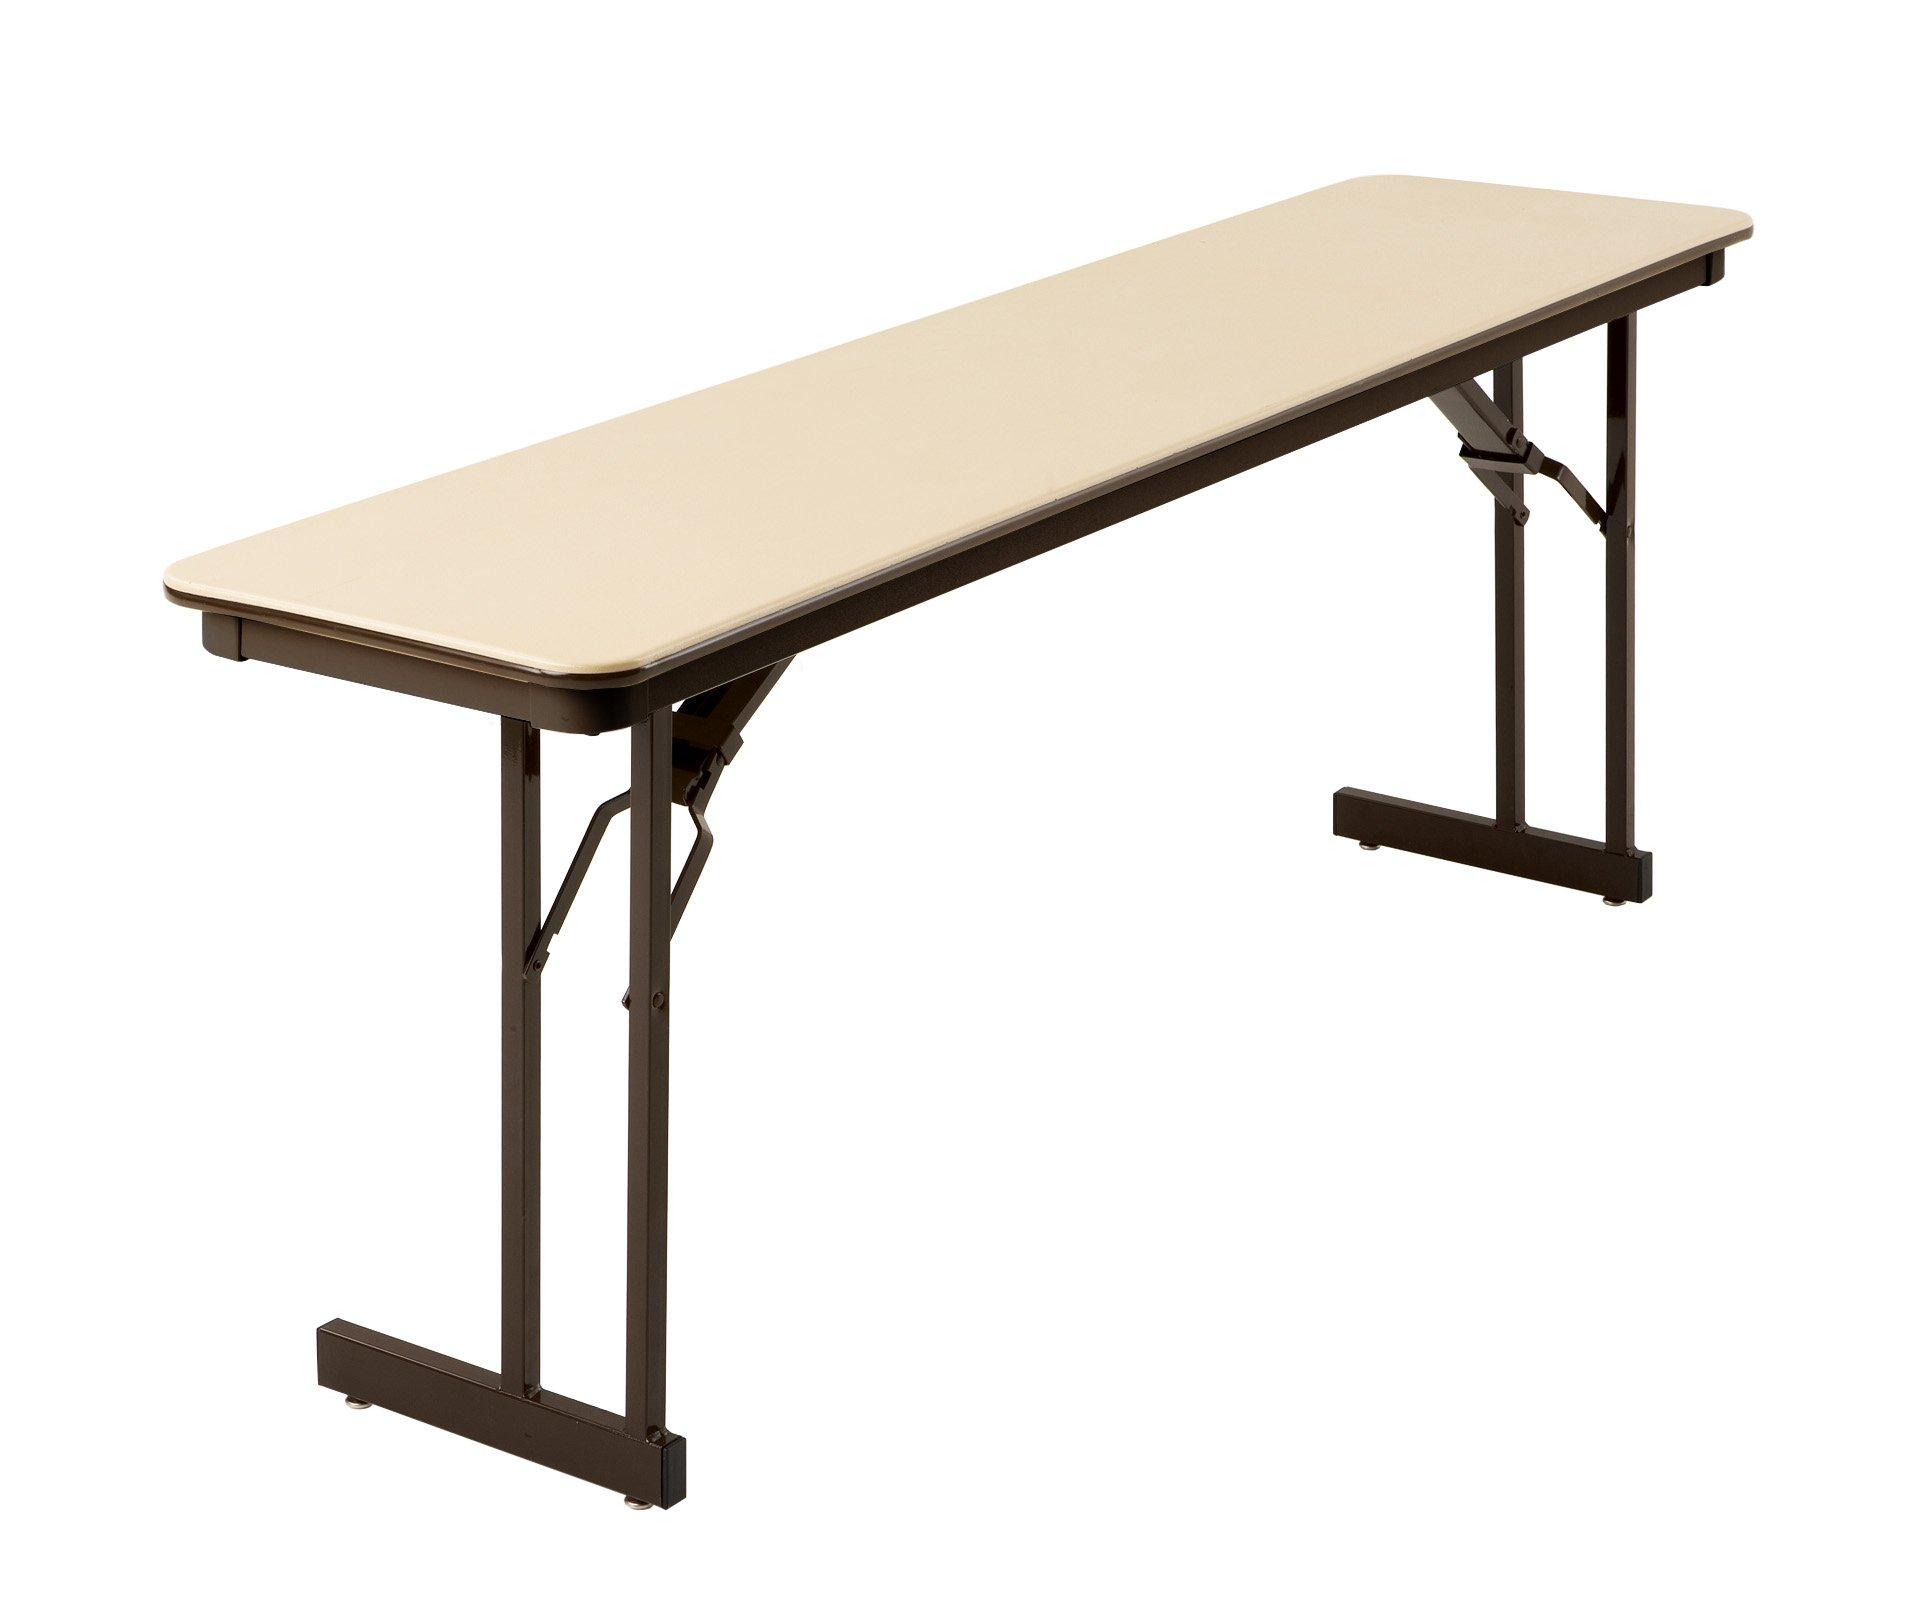 MityLite ABS Table, 18'' x 72'', Beige by MityLite